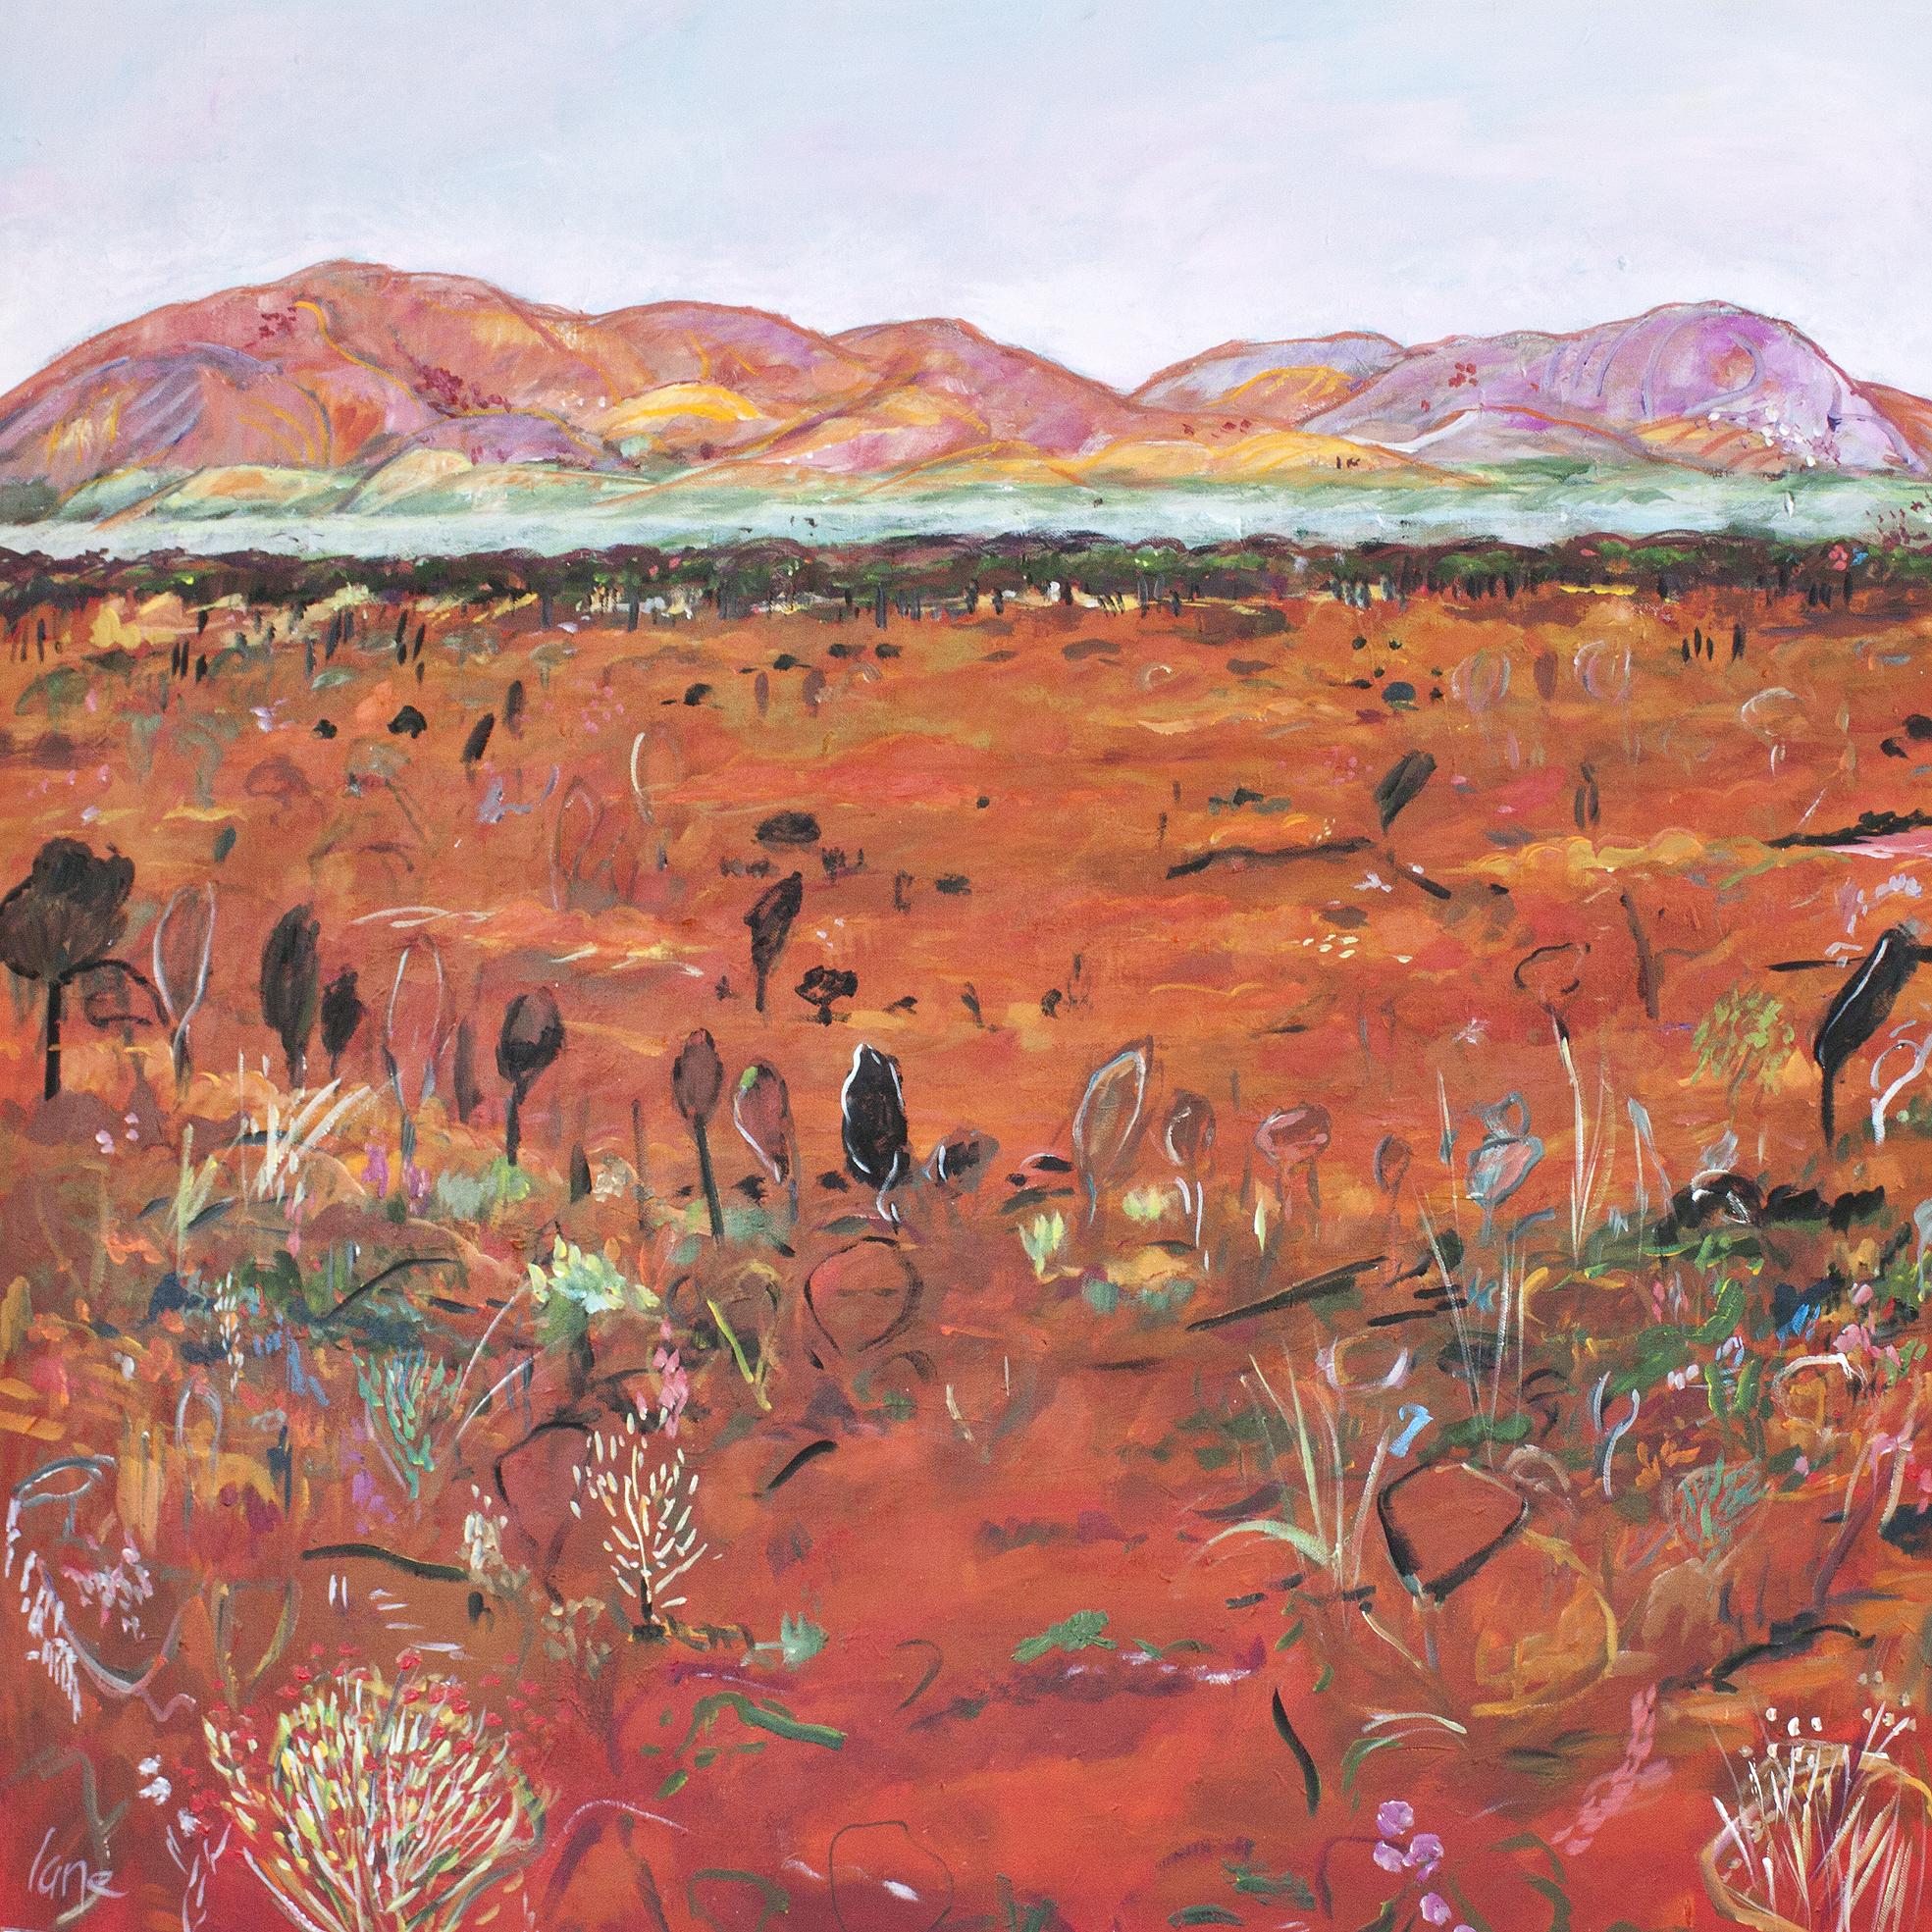 Kathleen Lane - The Corner Store Gallery, Orange NSW